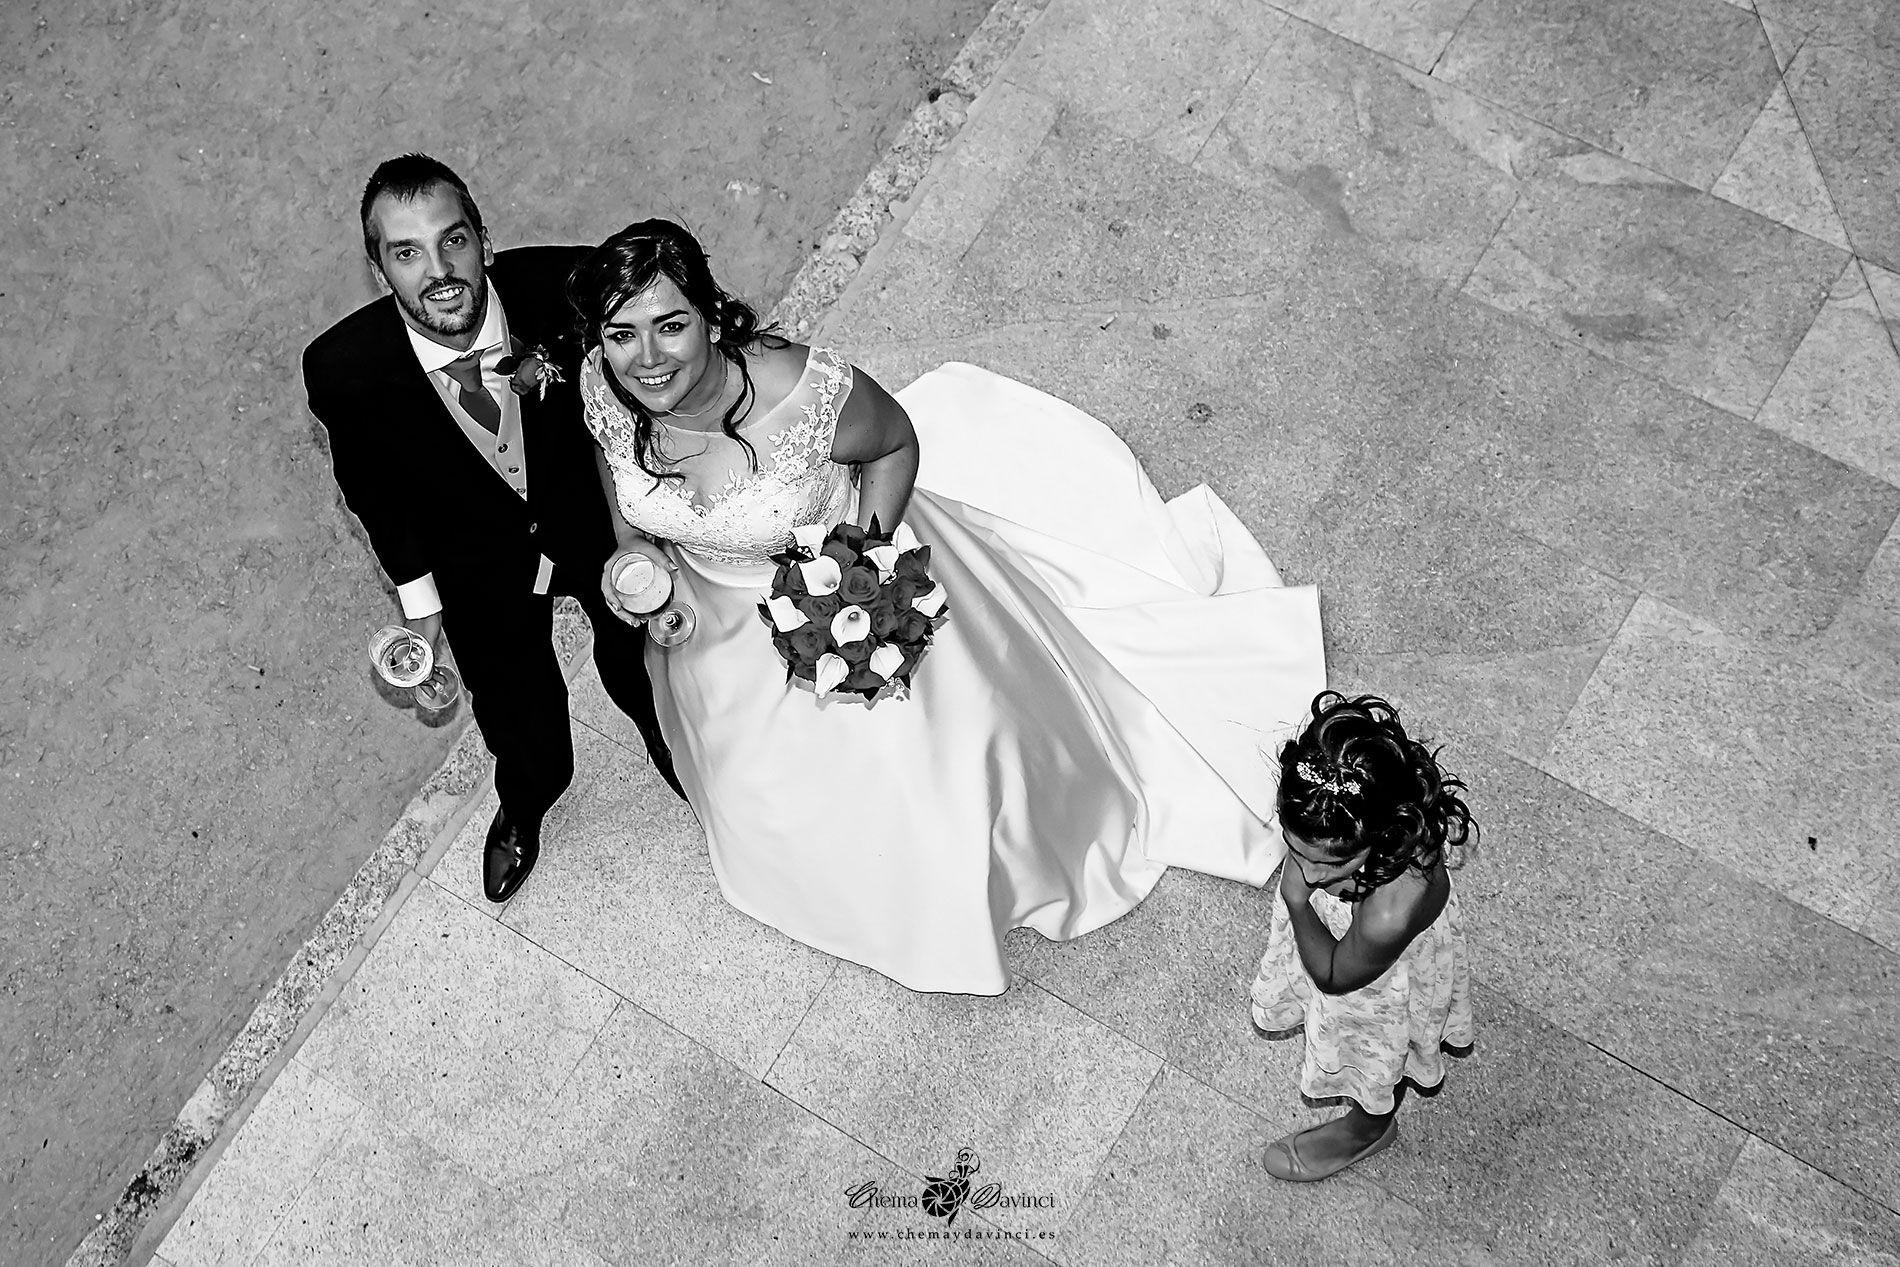 Fotógrafos de Boda Chema & Davinci